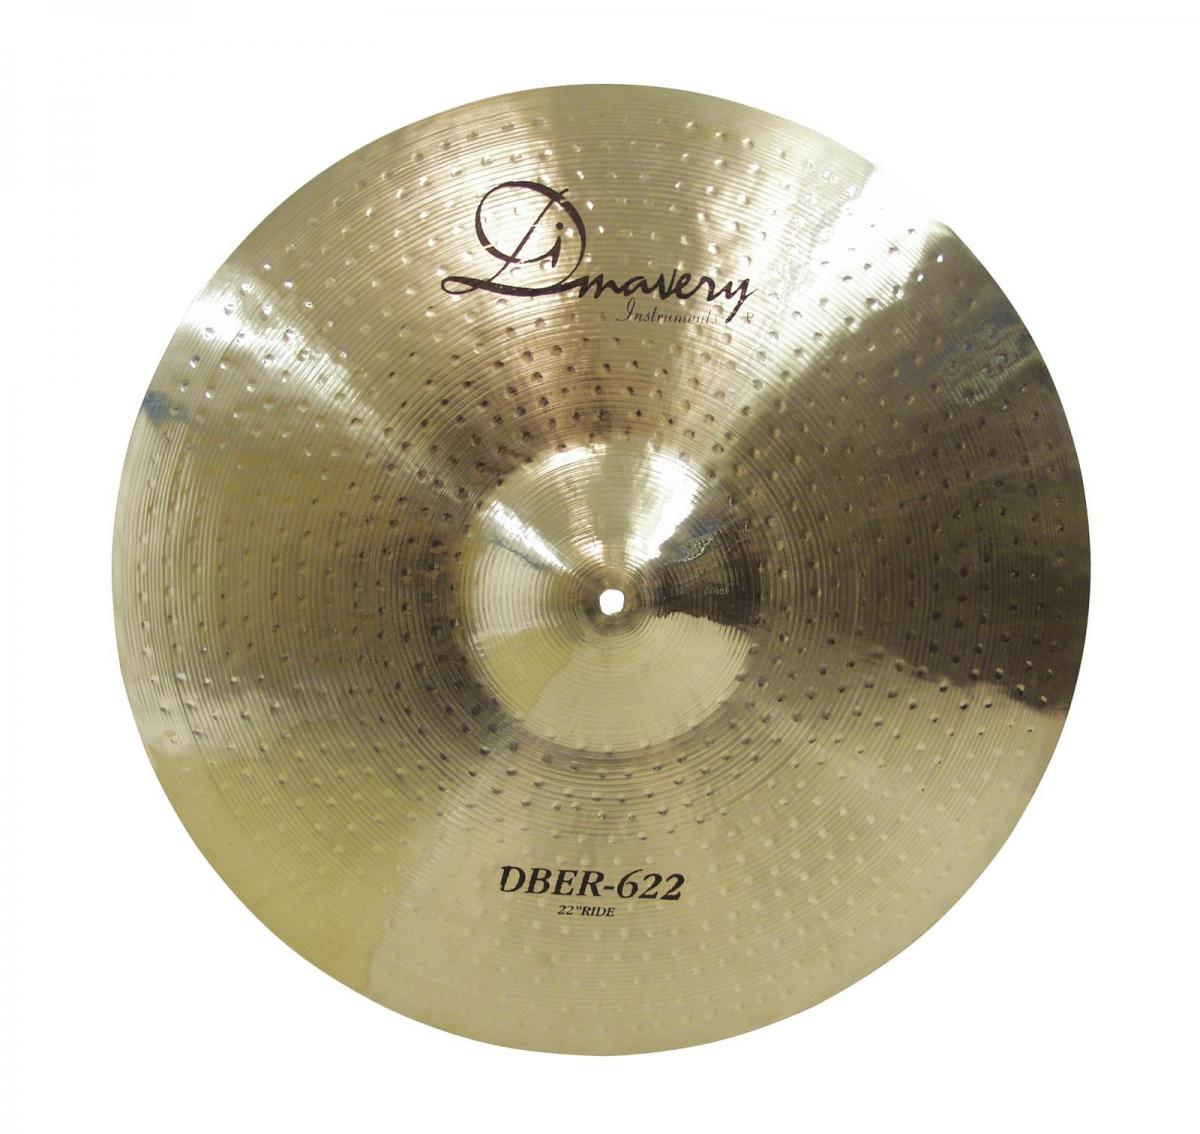 DIMAVERYDBER-622 Cymbal 22-Ride